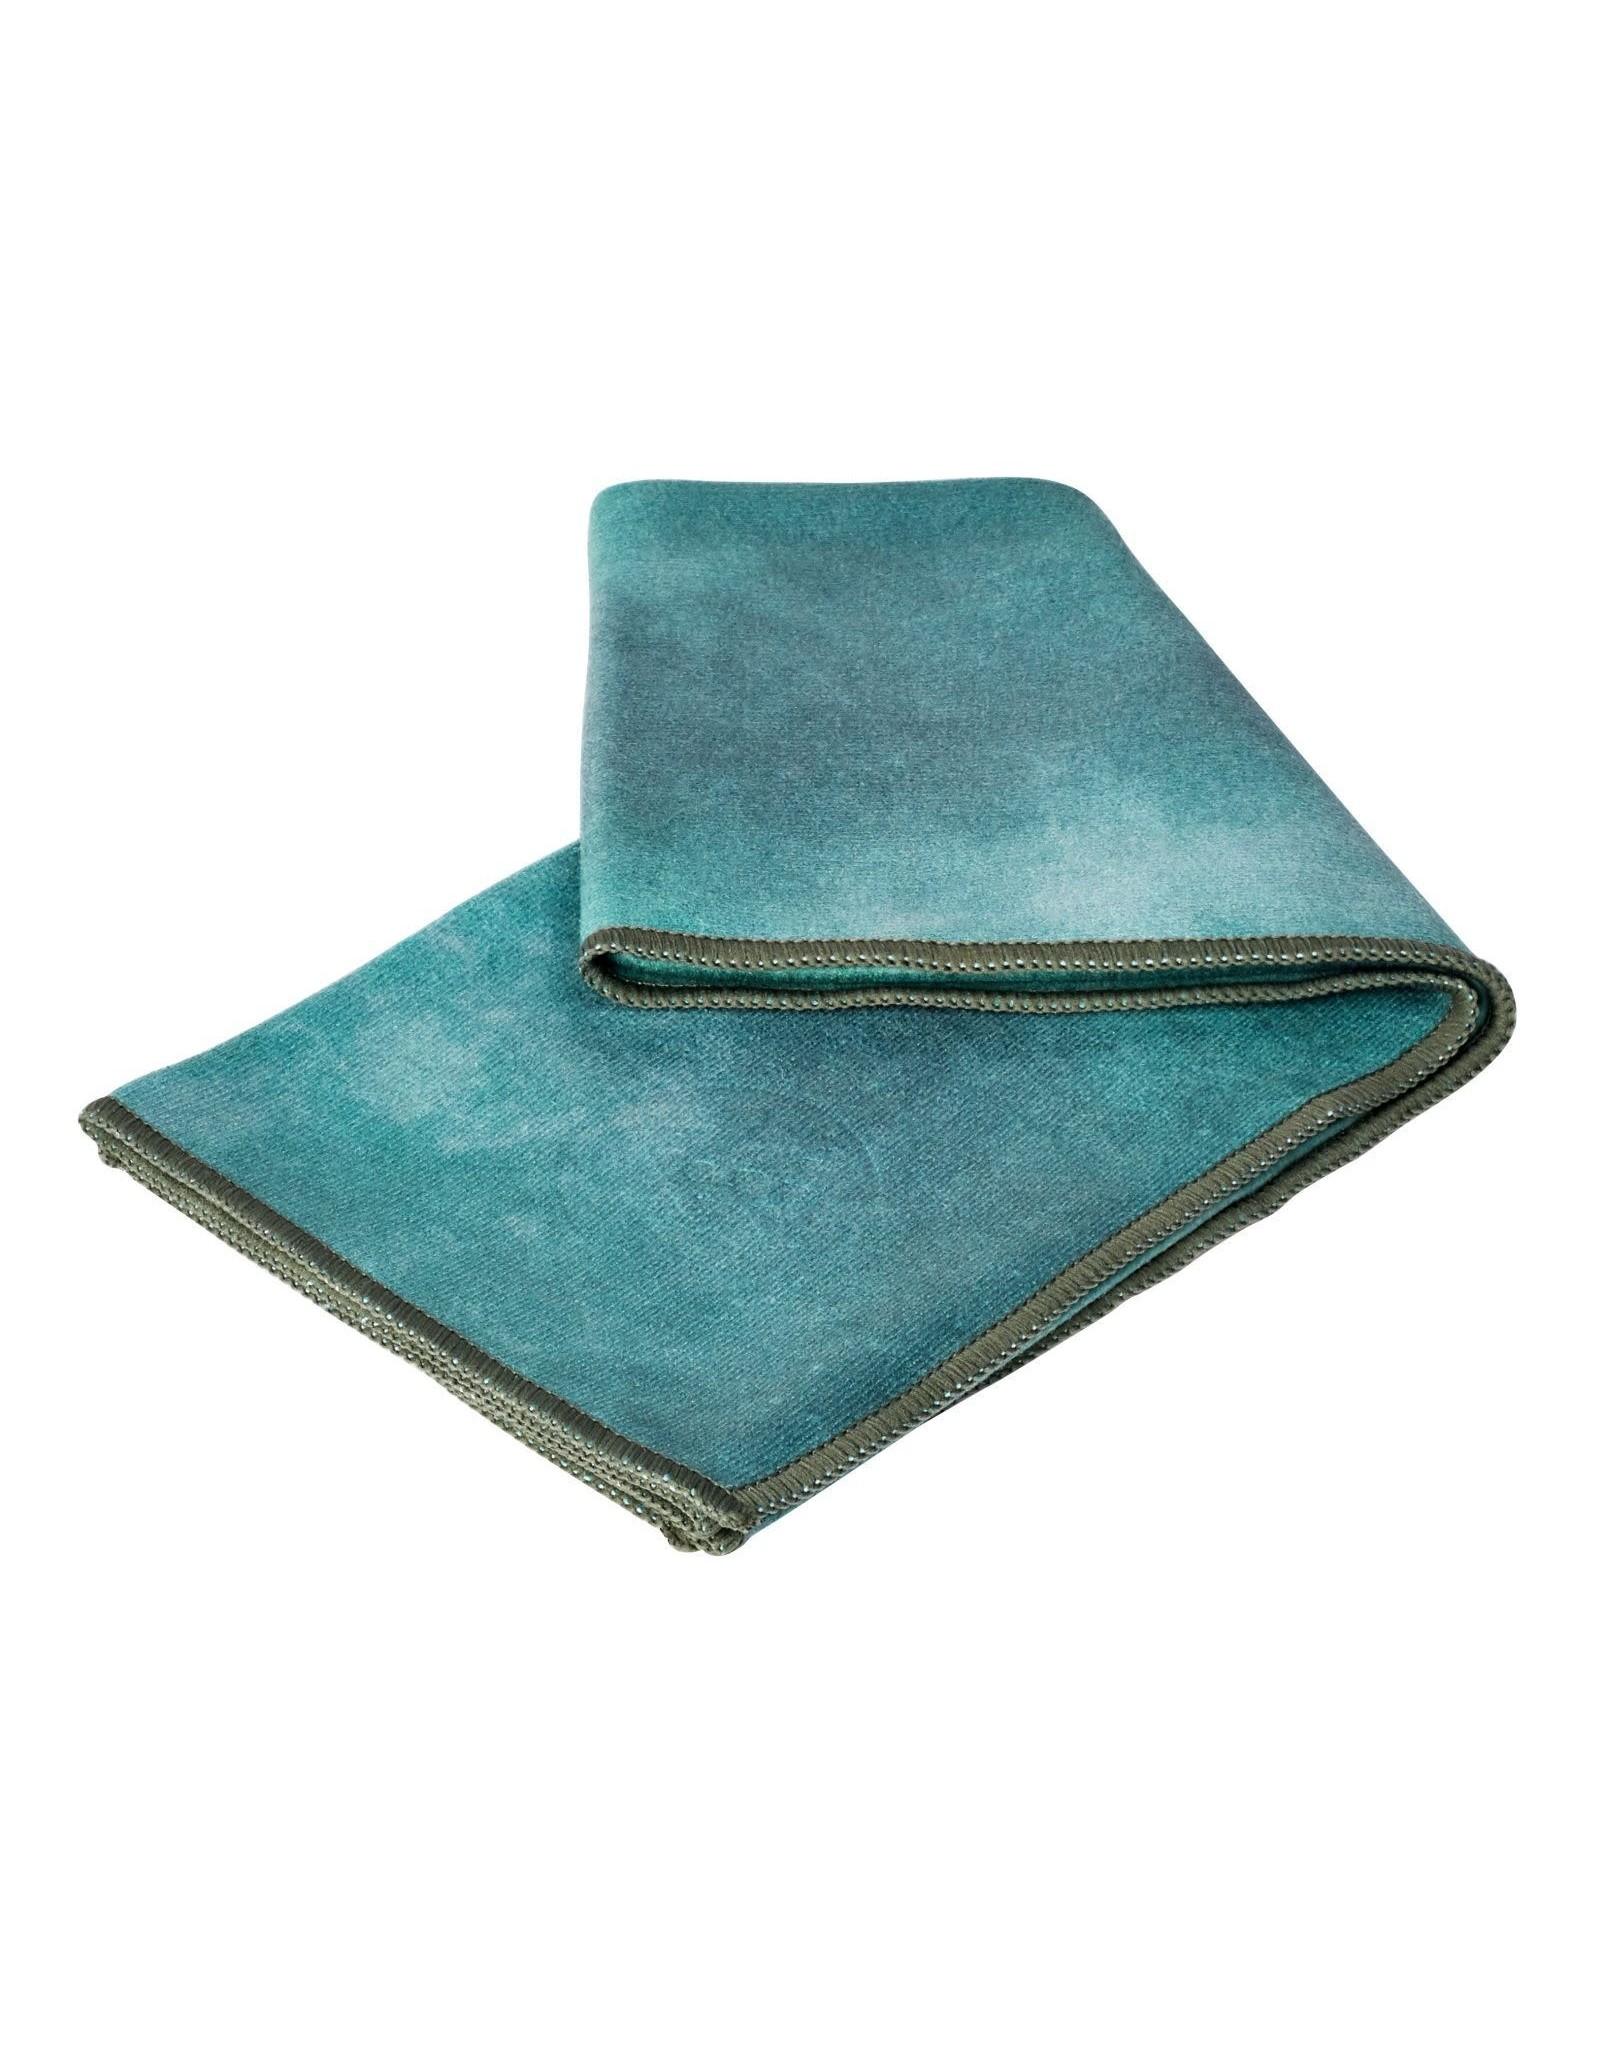 Manduka Towel Camo Tie Dye Greens